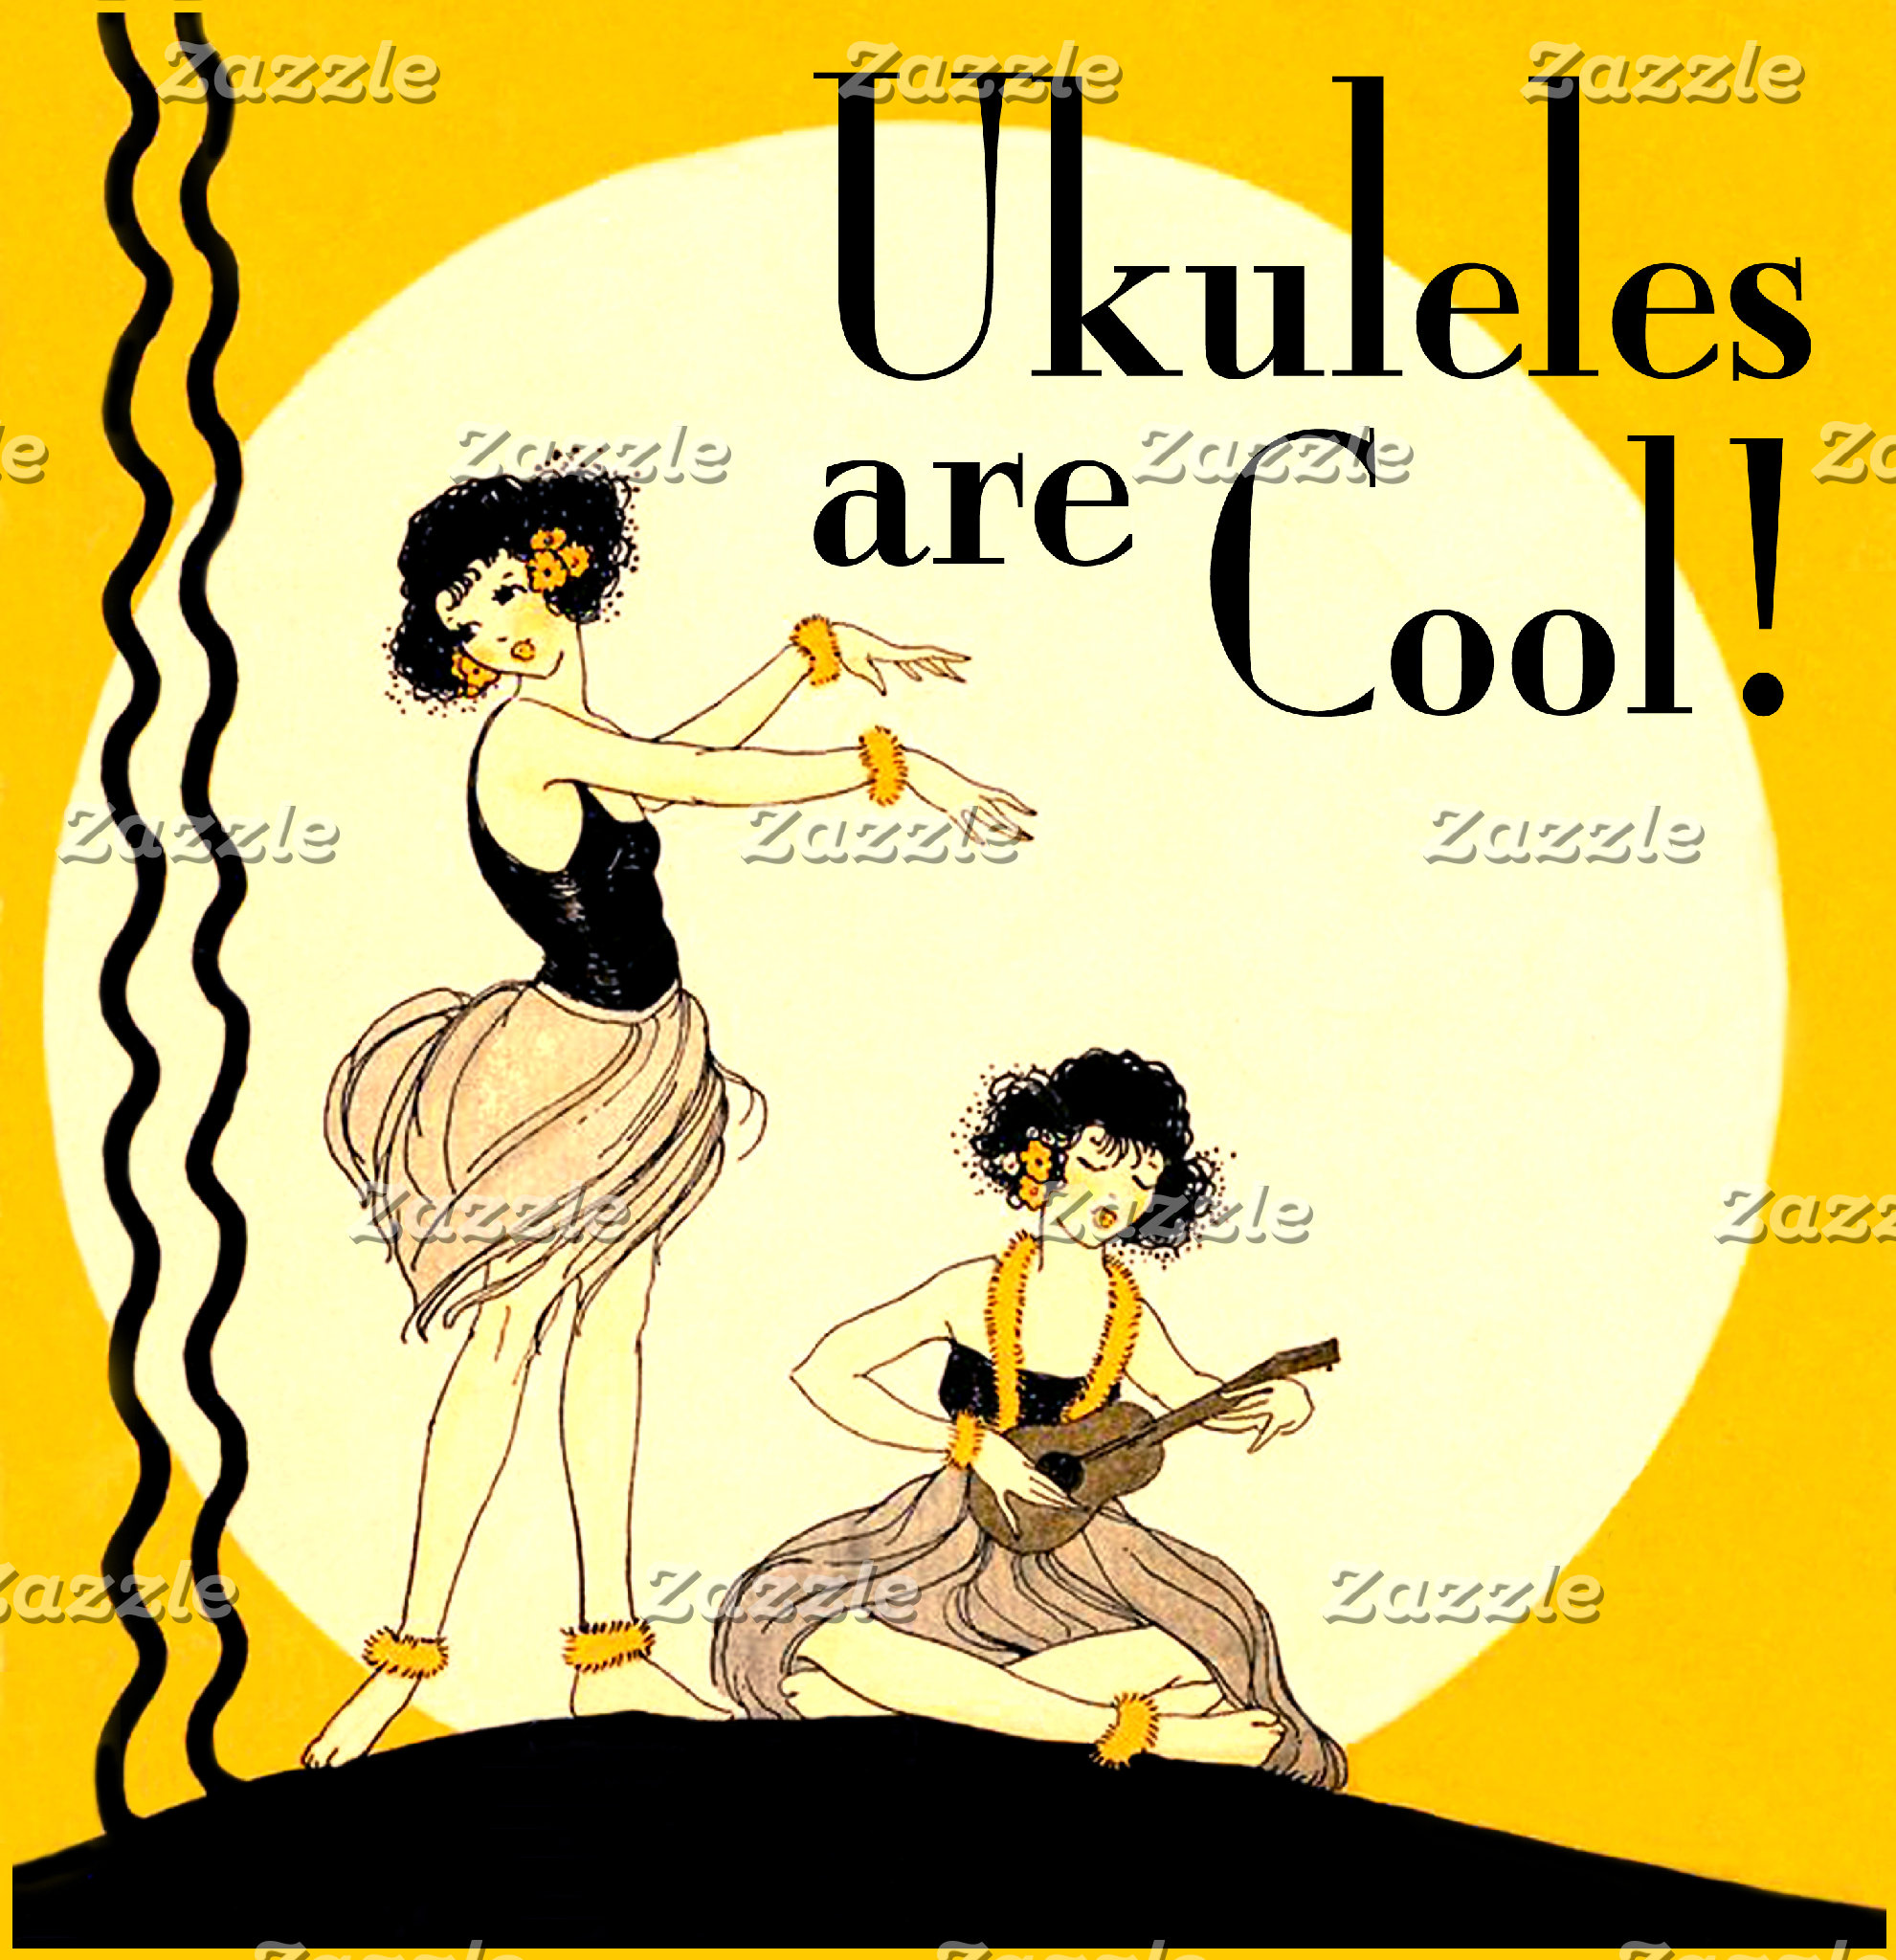 Ukuleles are Cool!